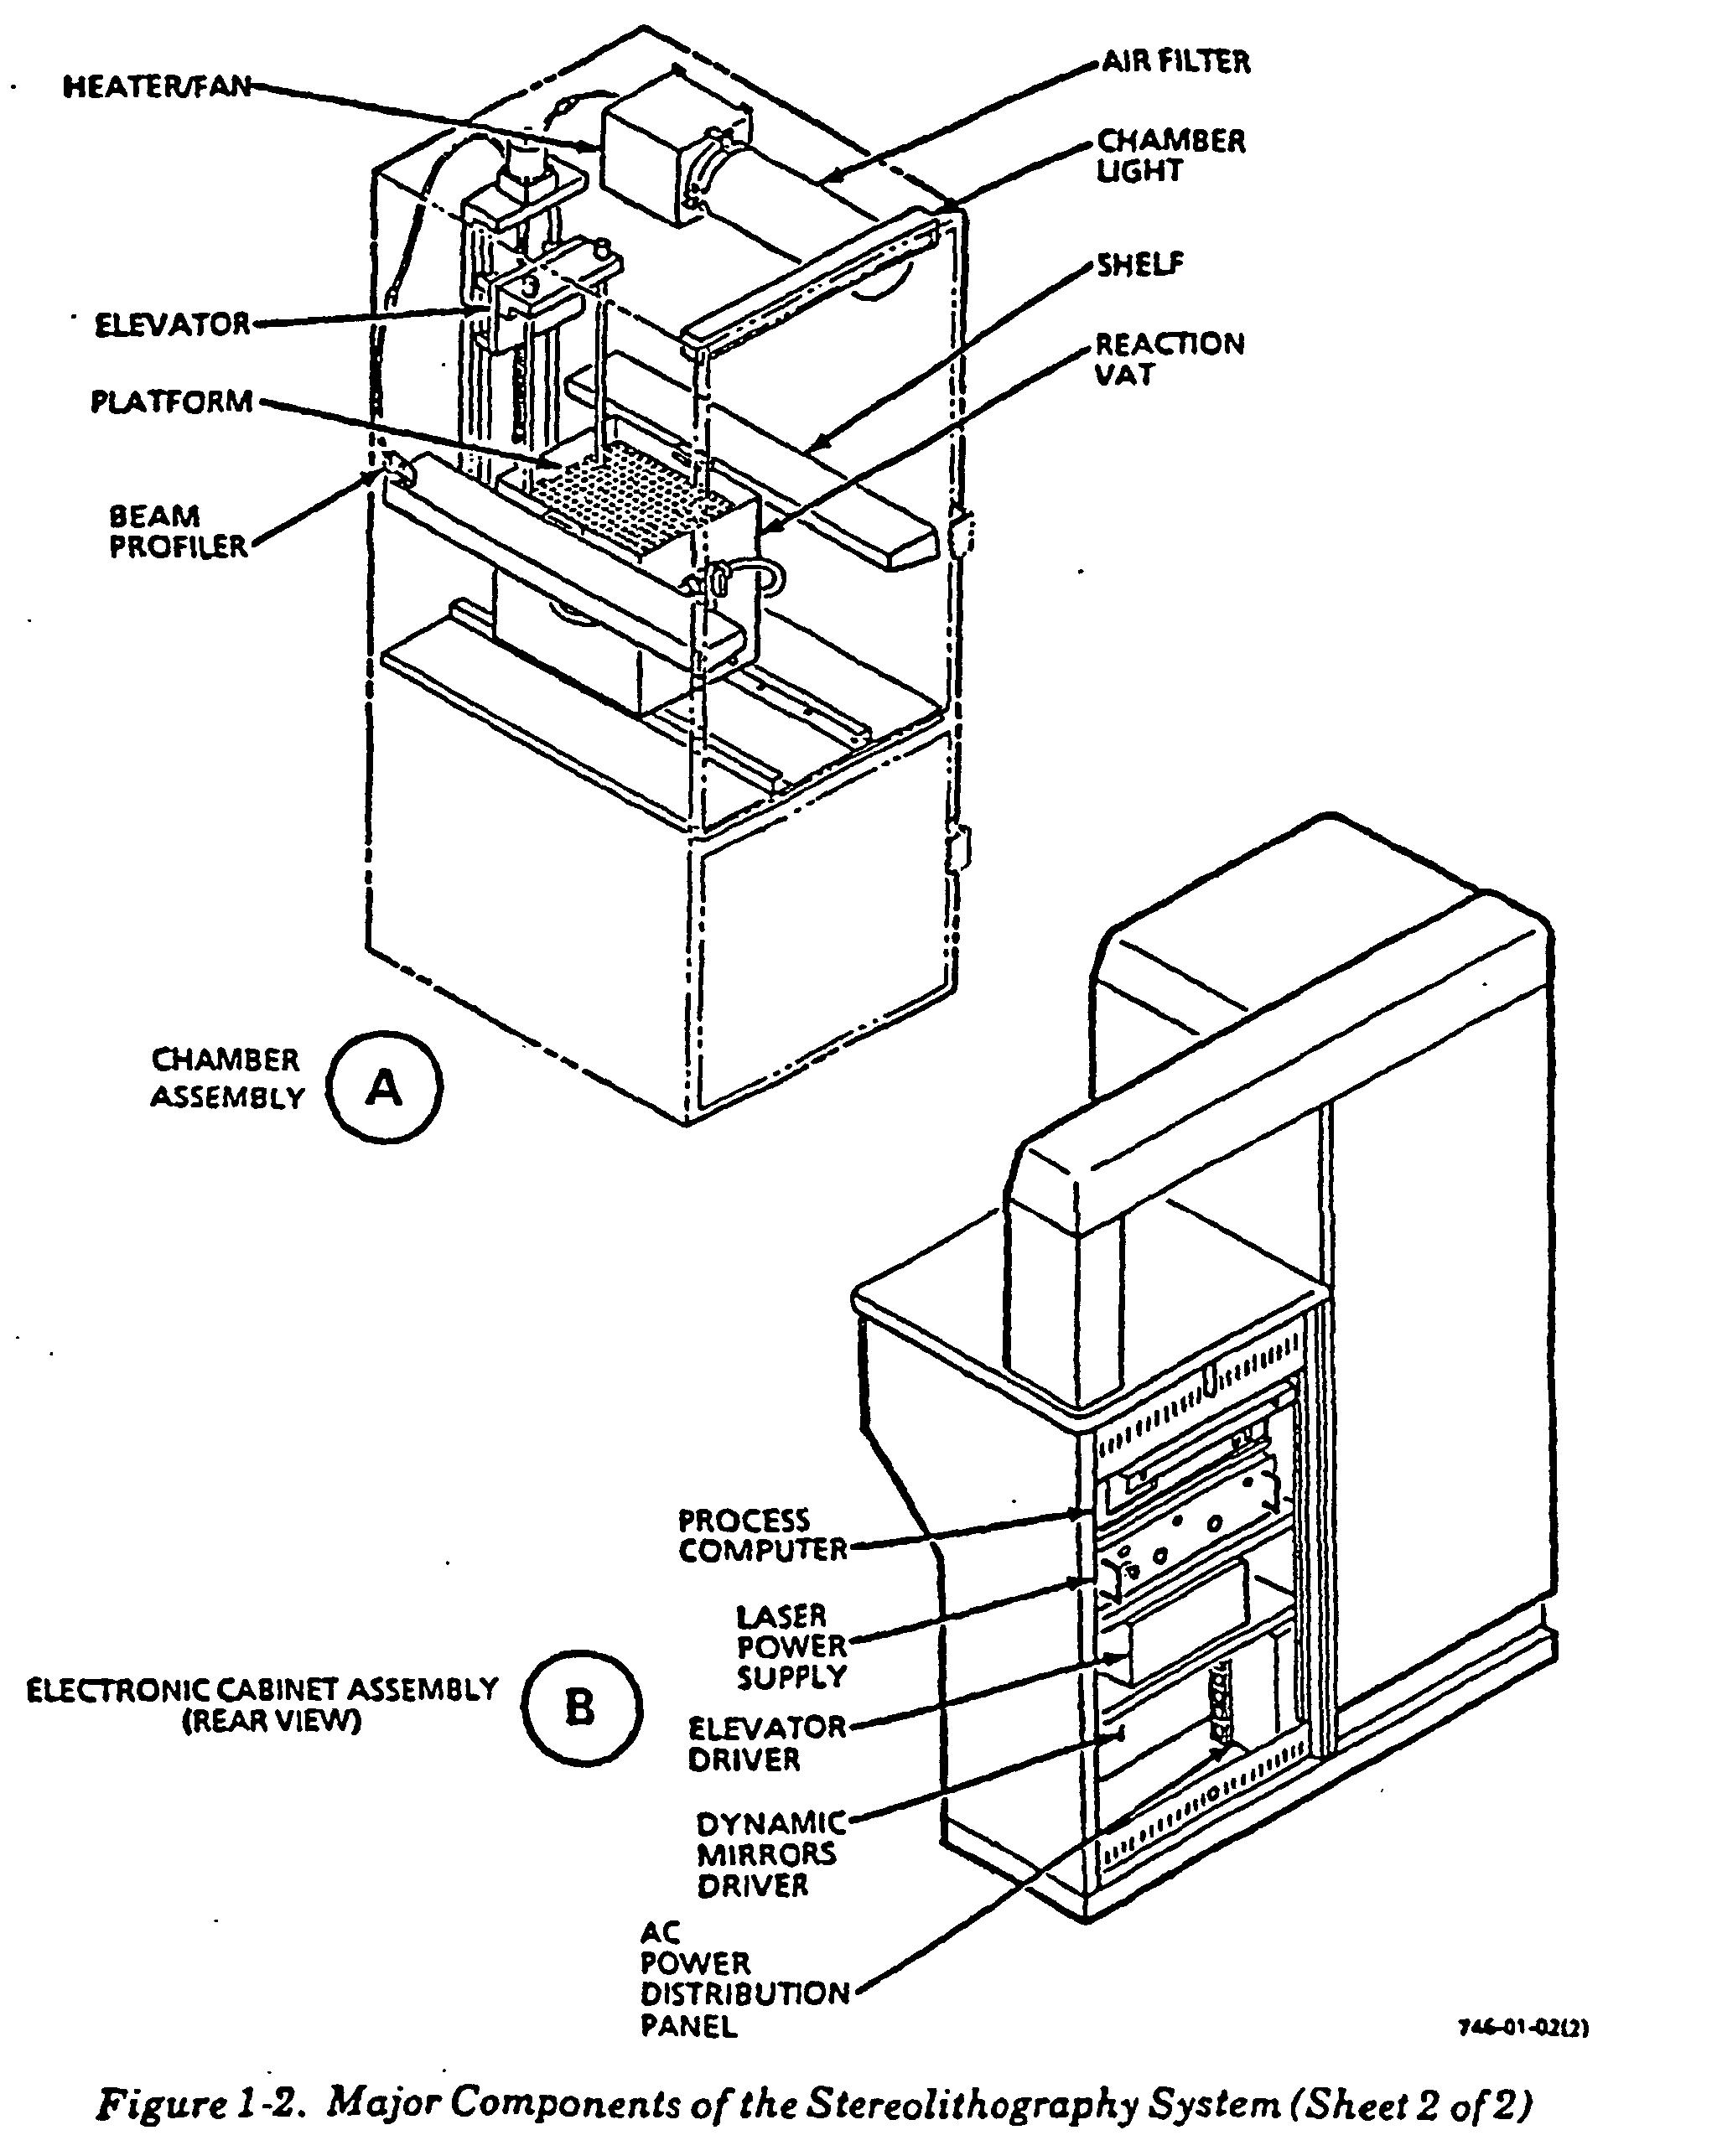 Air Lift 16130 Wiring Diagram. . Wiring Diagram M N Ch Ovka Heil Air Conditioner Wiring Diagram on